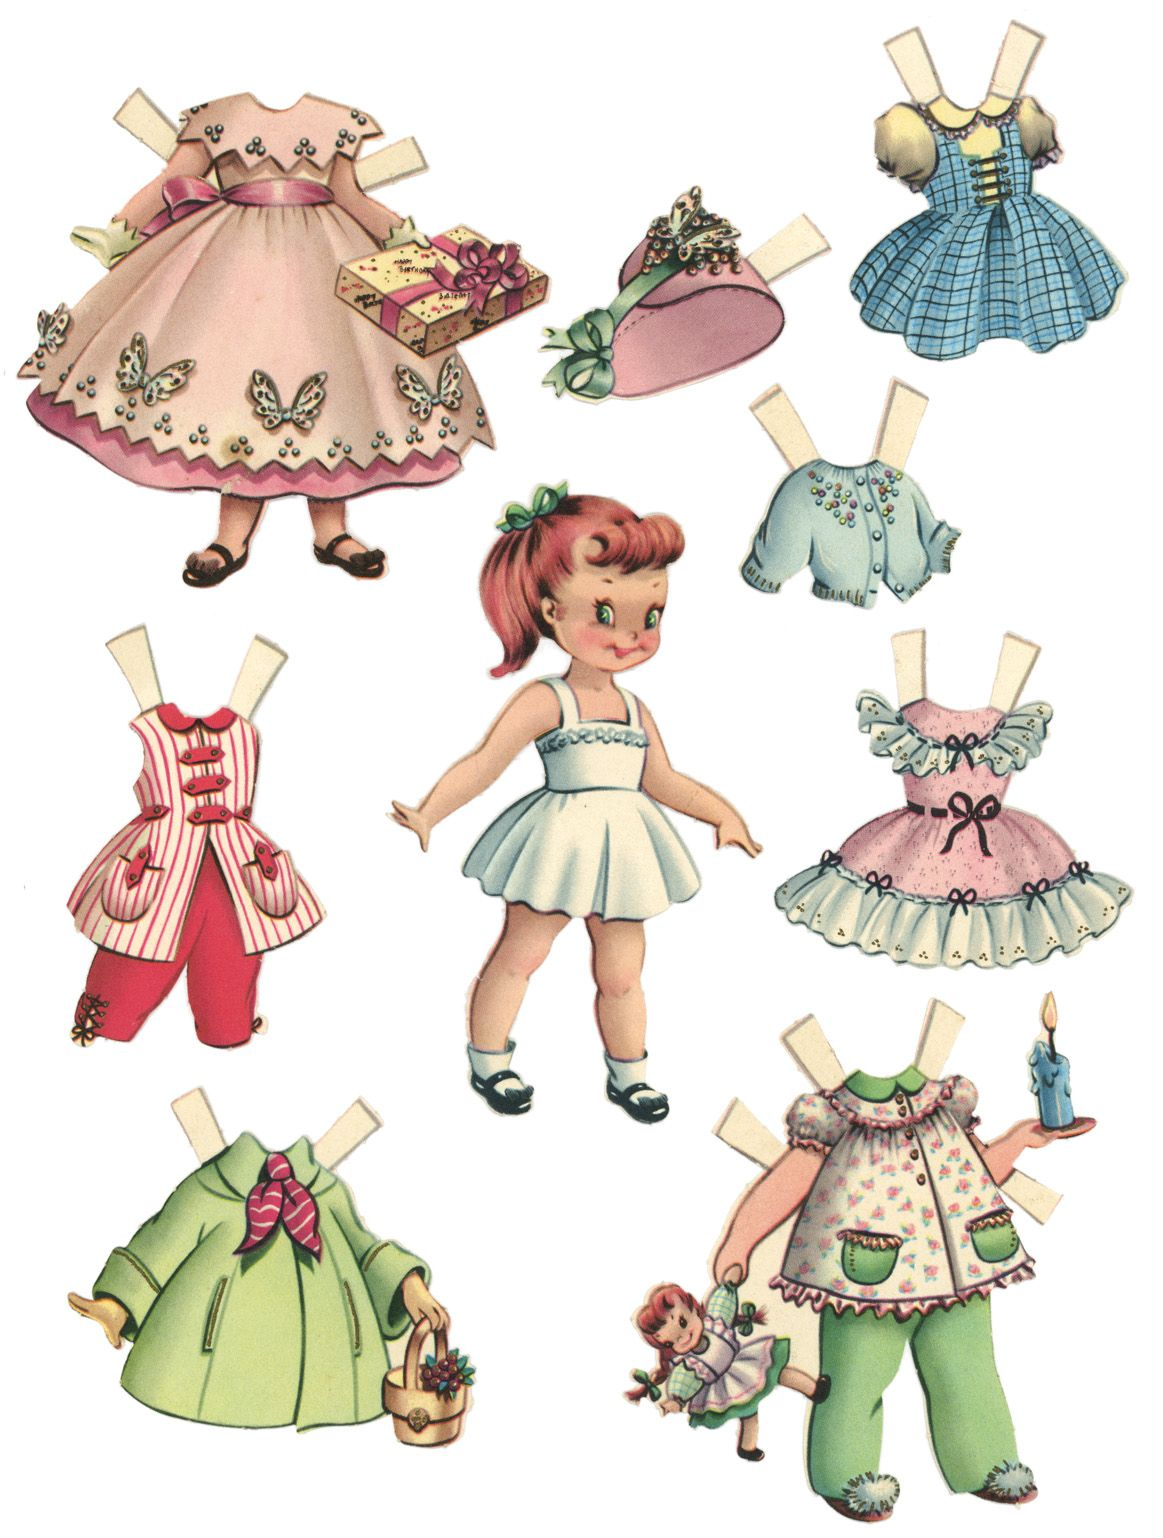 10 Free Printable Paper Dolls